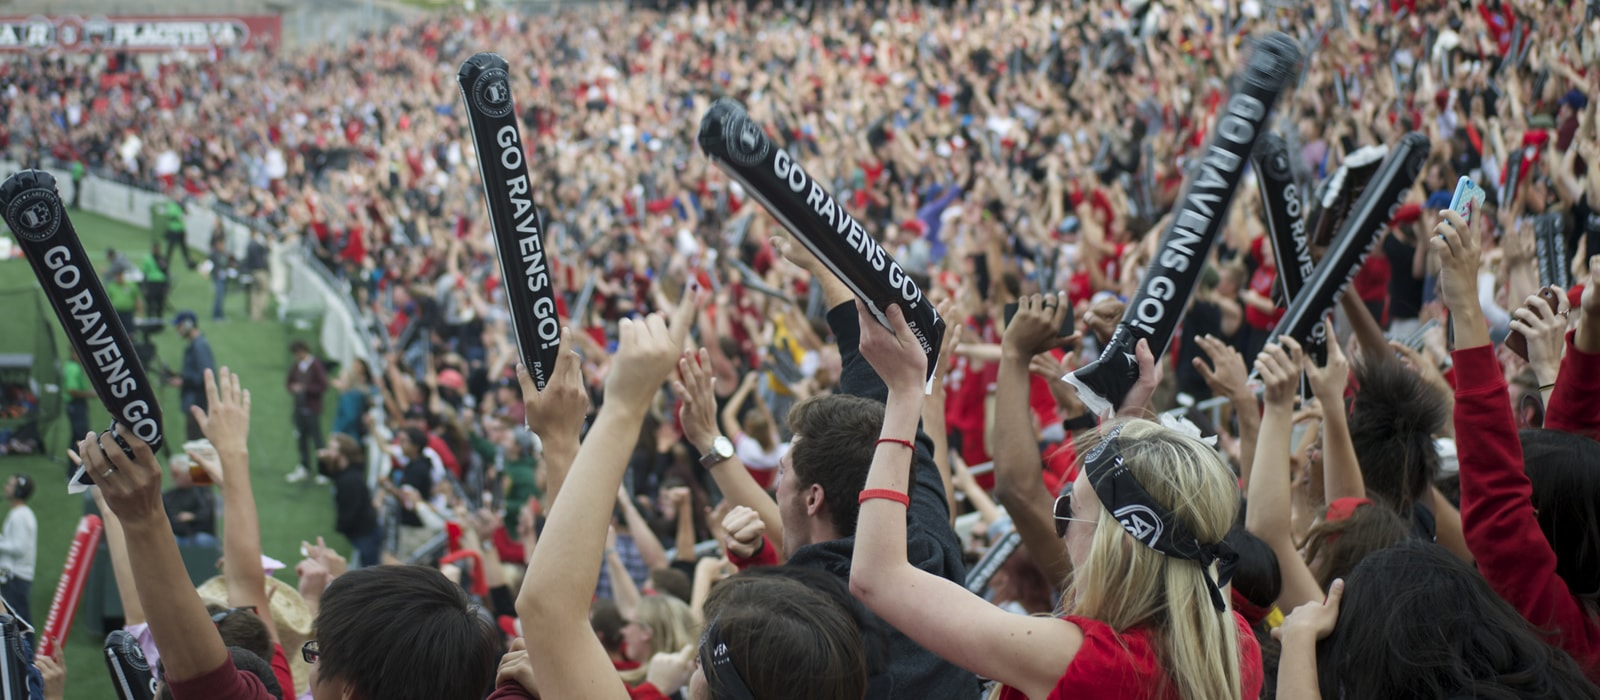 Students cheering at a Ravens Football game.